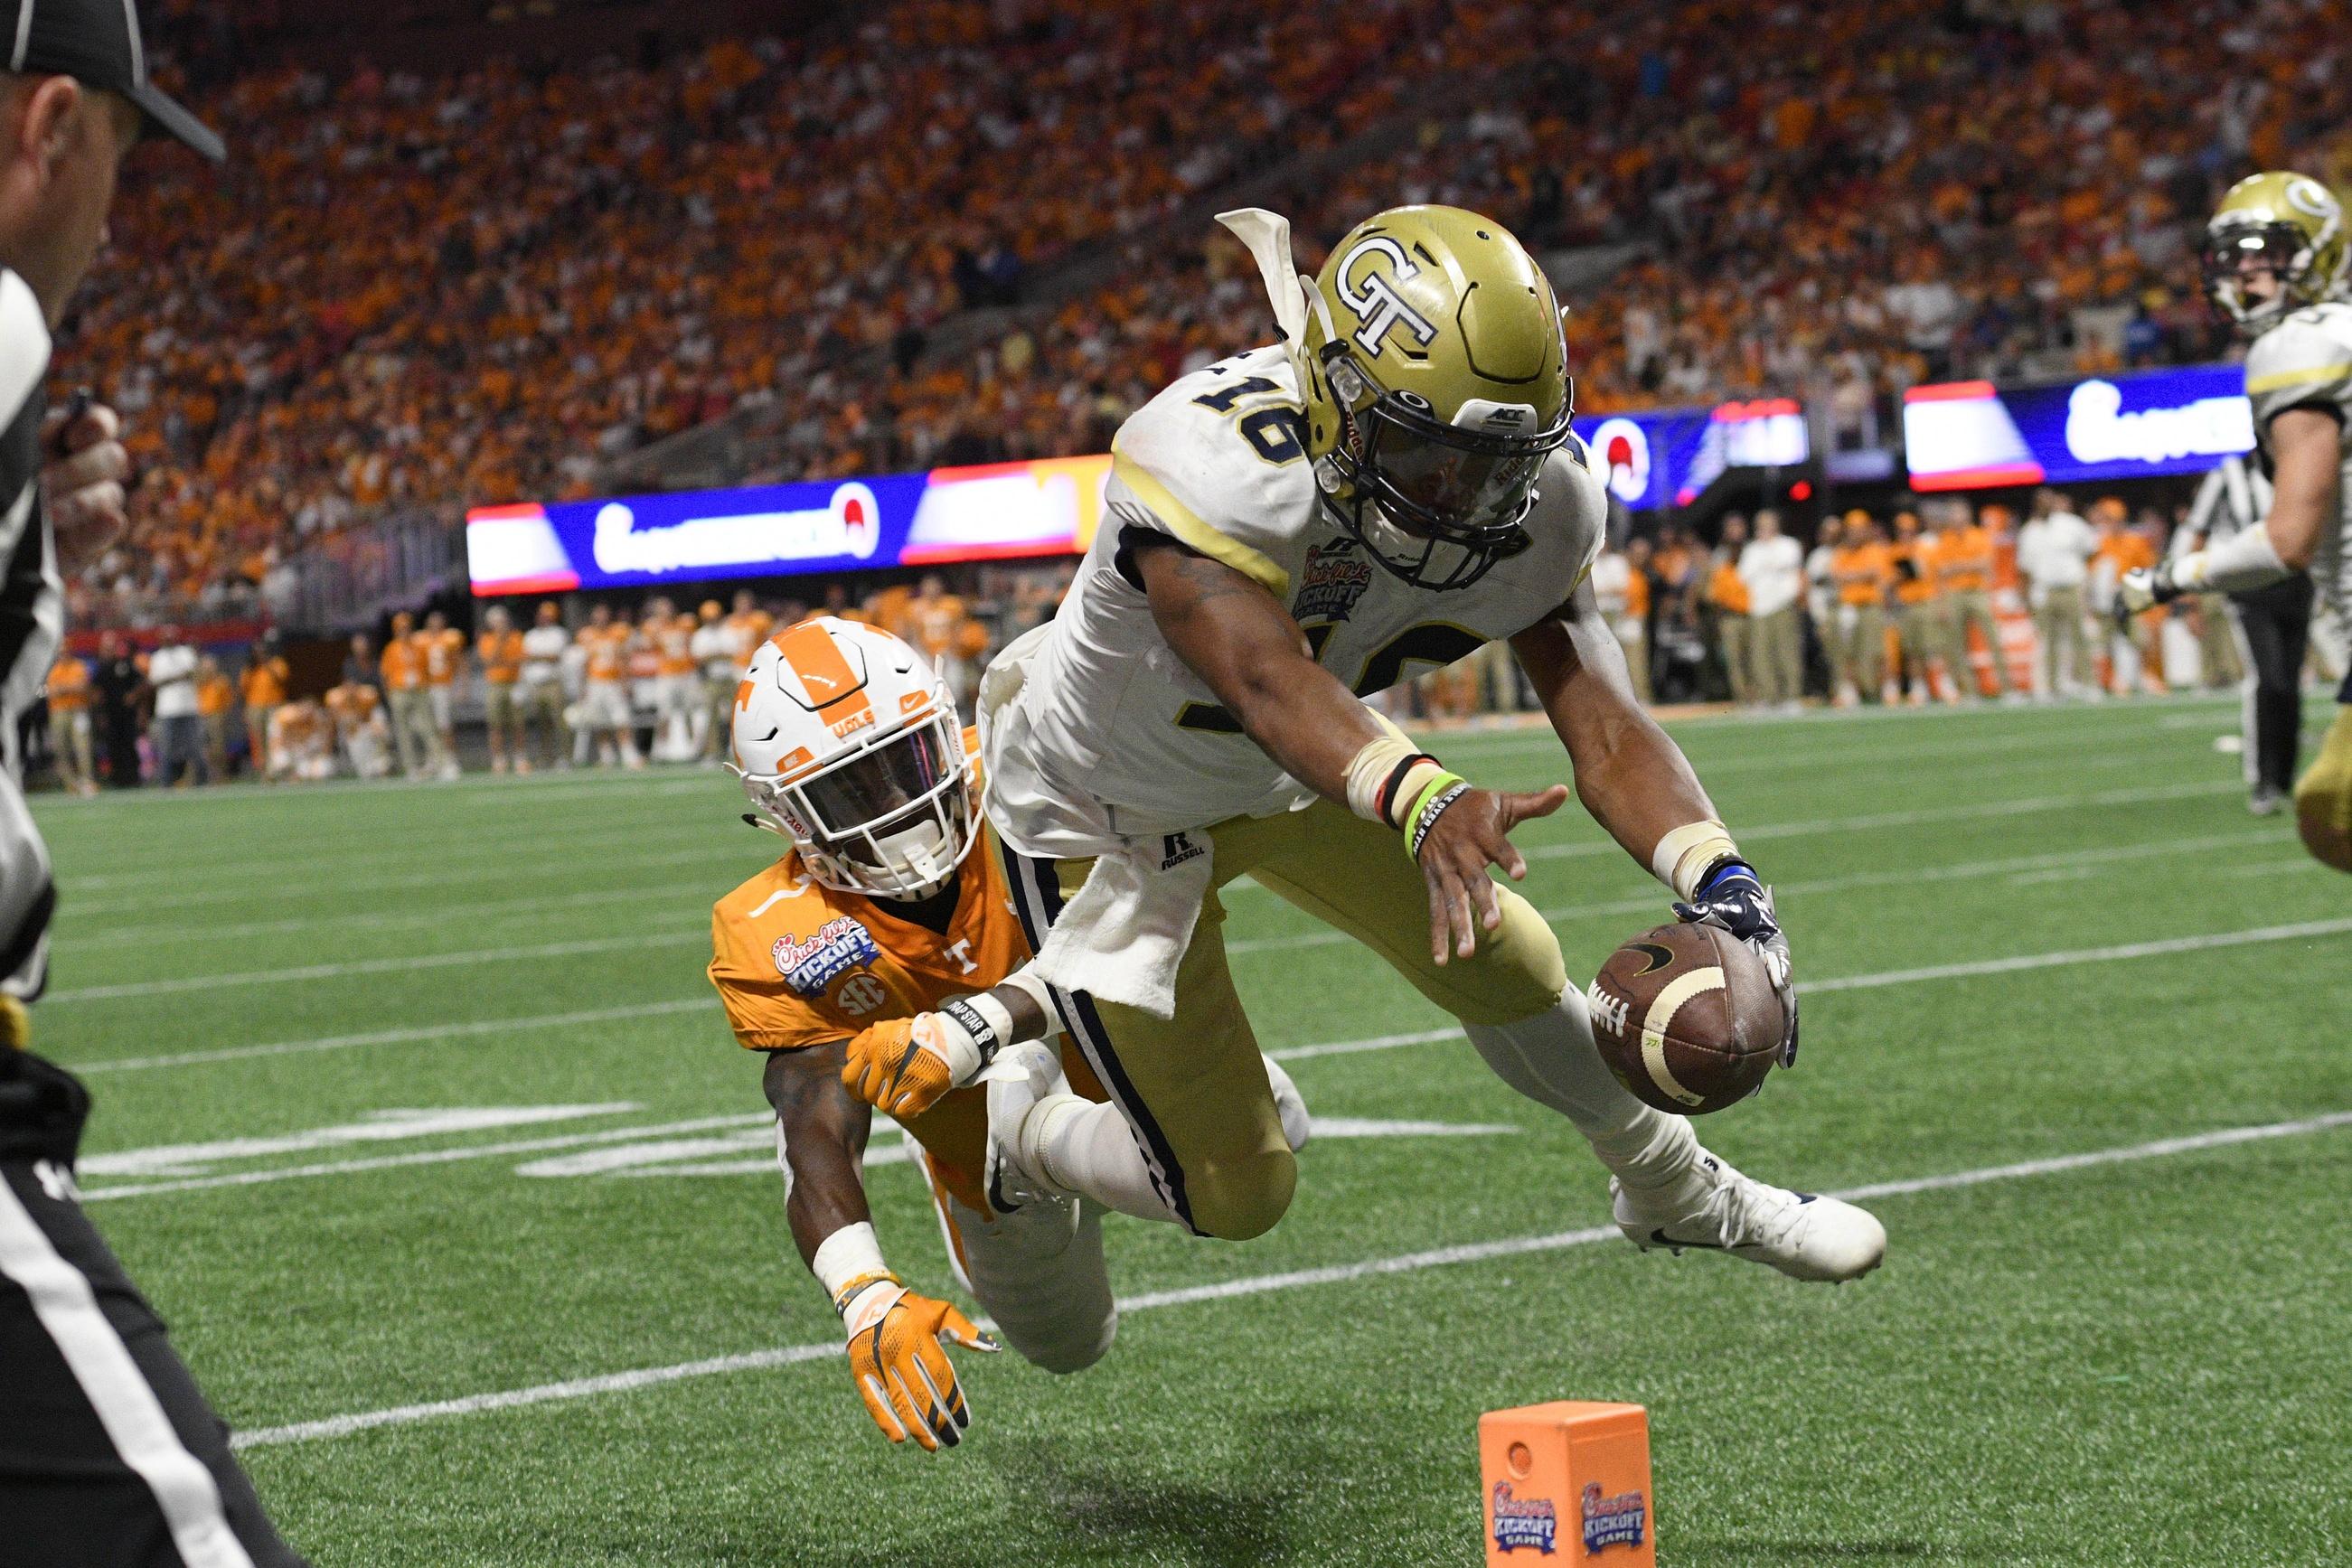 Georgia Tech quarterback TaQuon Marshall